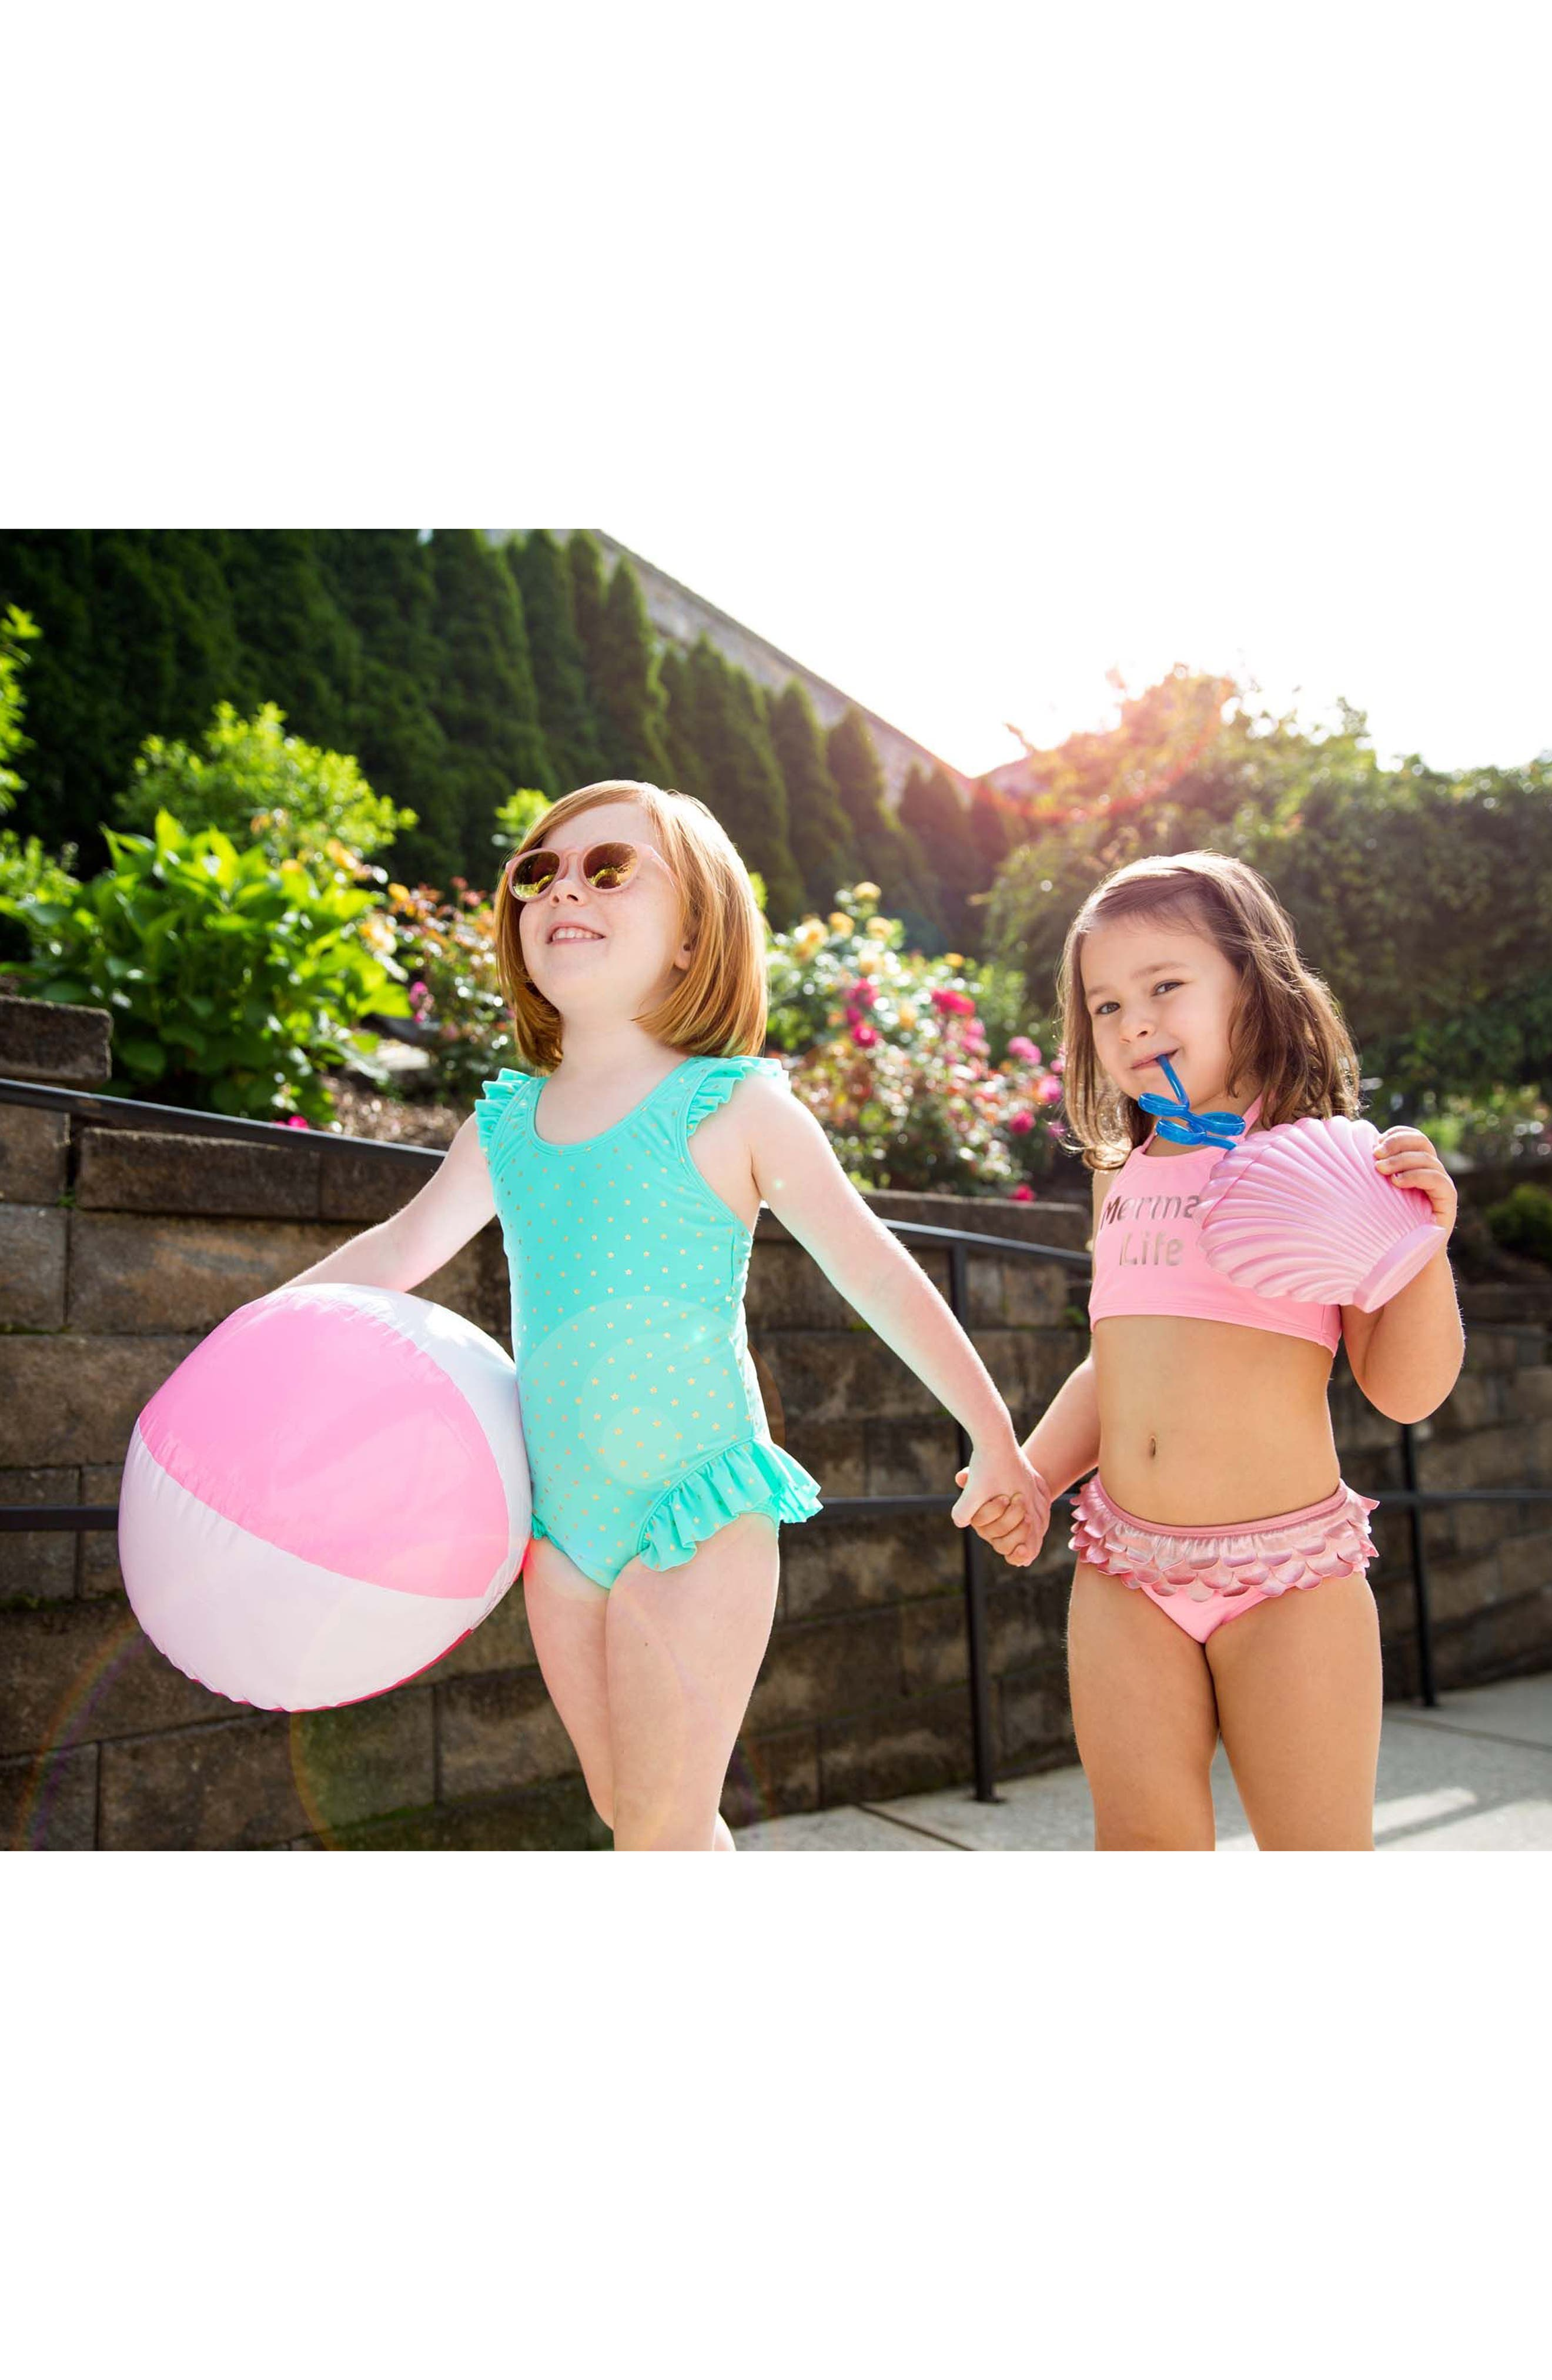 Alternate Image 3  - Hula Star Twinkle Star One-Piece Swimsuit (Toddler Girls & Little Girls)